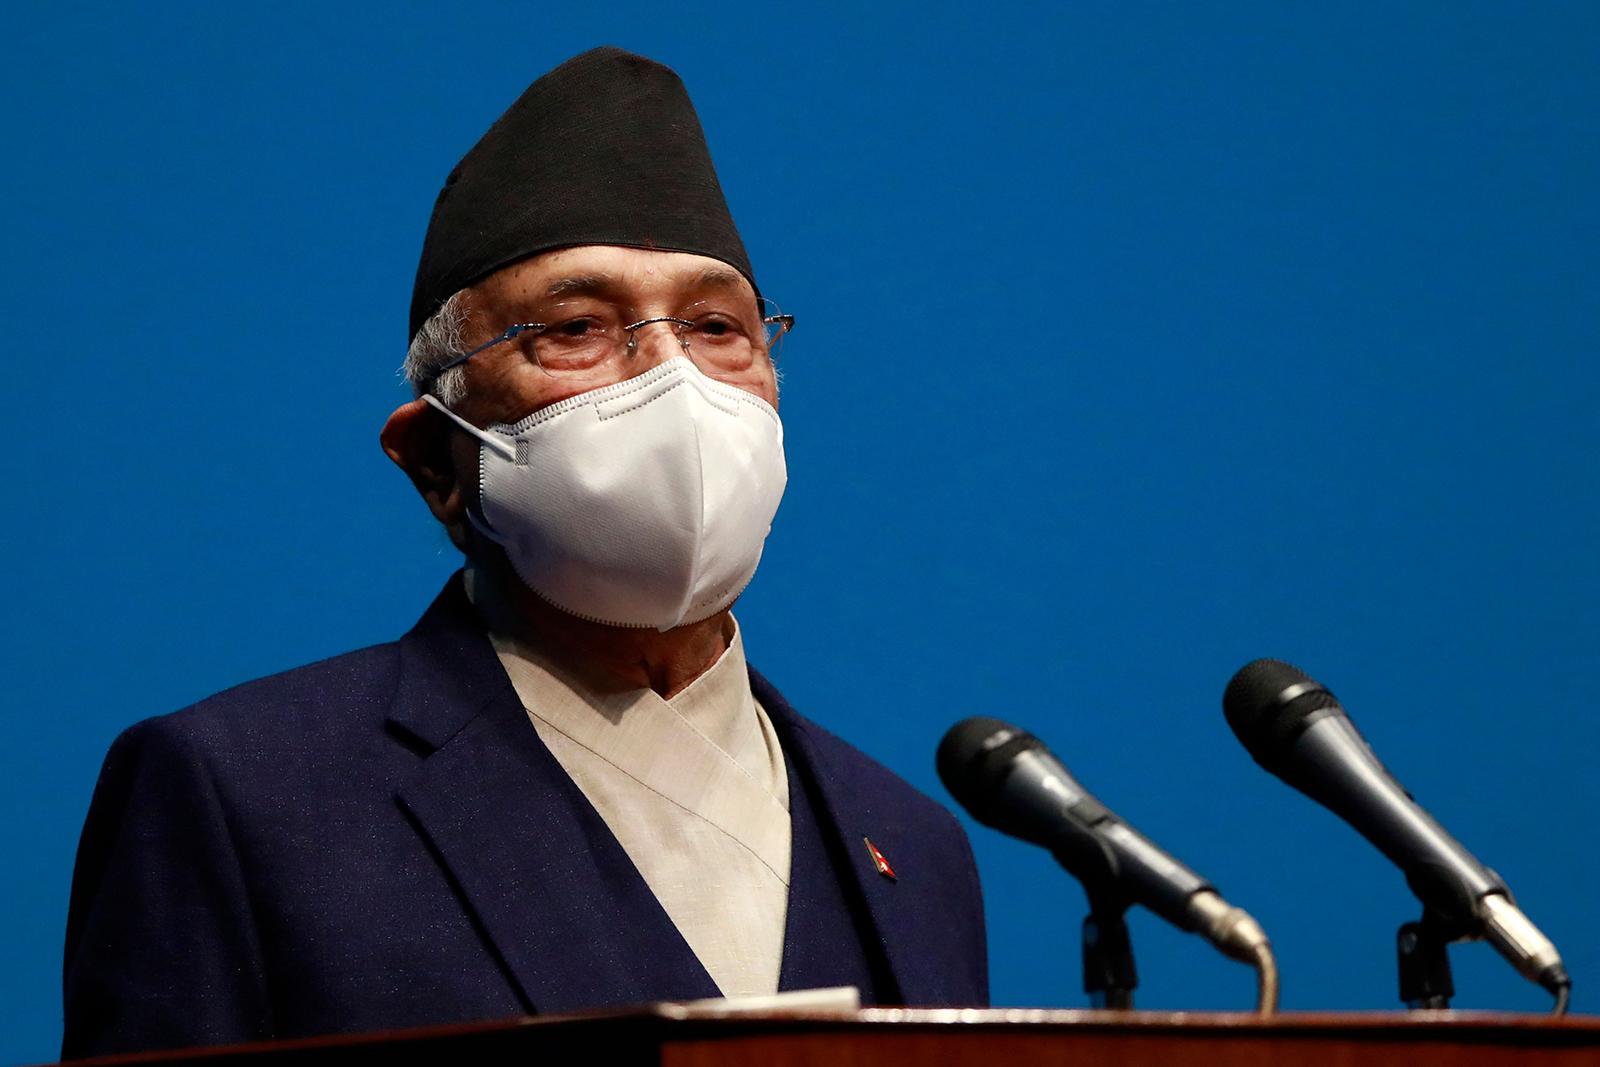 Nepal's leader K.P. Sharma Oli speaks at parliament in Kathmandu, Nepal, on May 10.